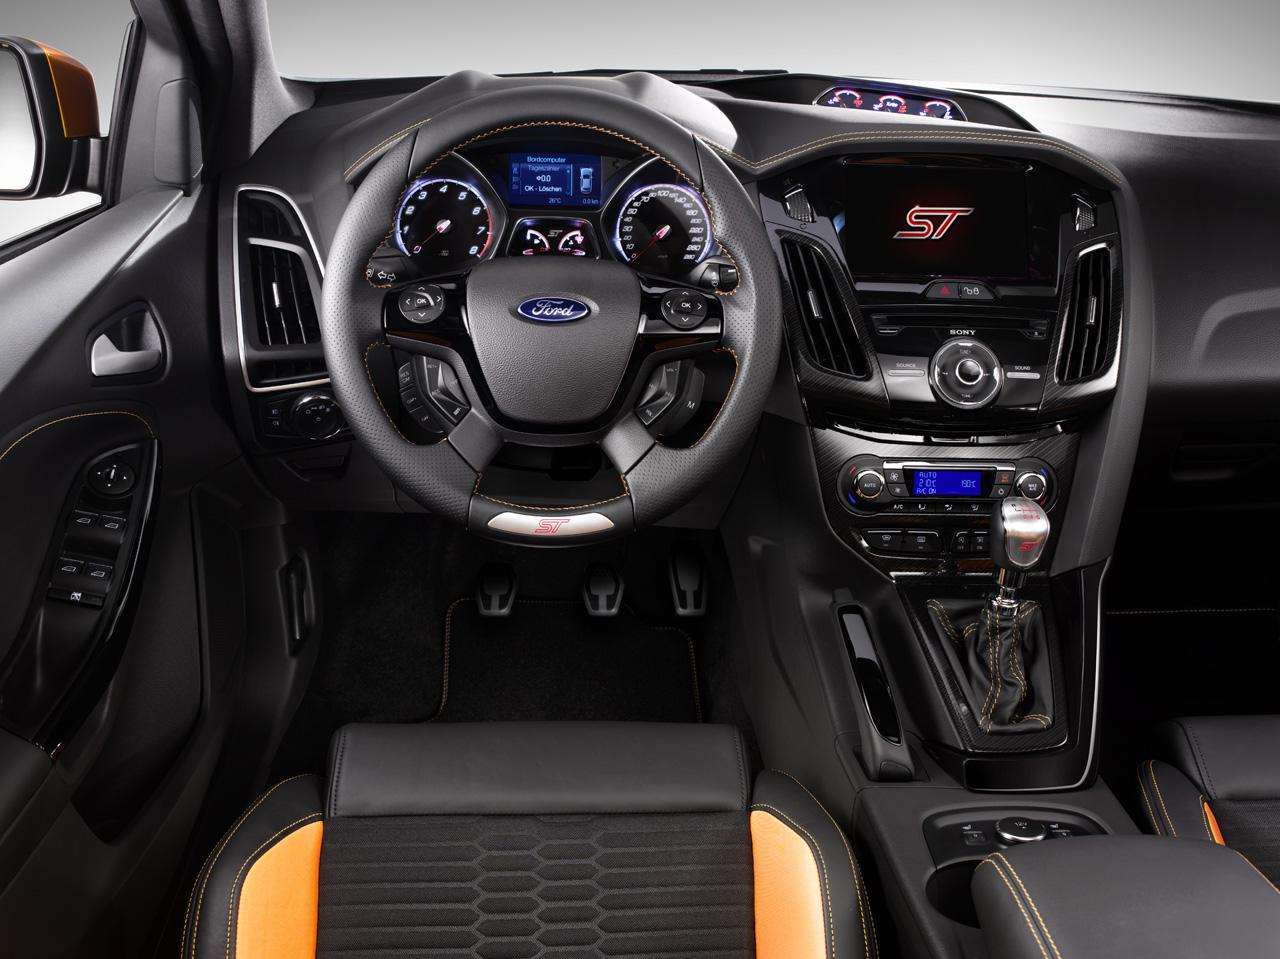 2012 Ford Focus St Review Price Interior Exterior Engine